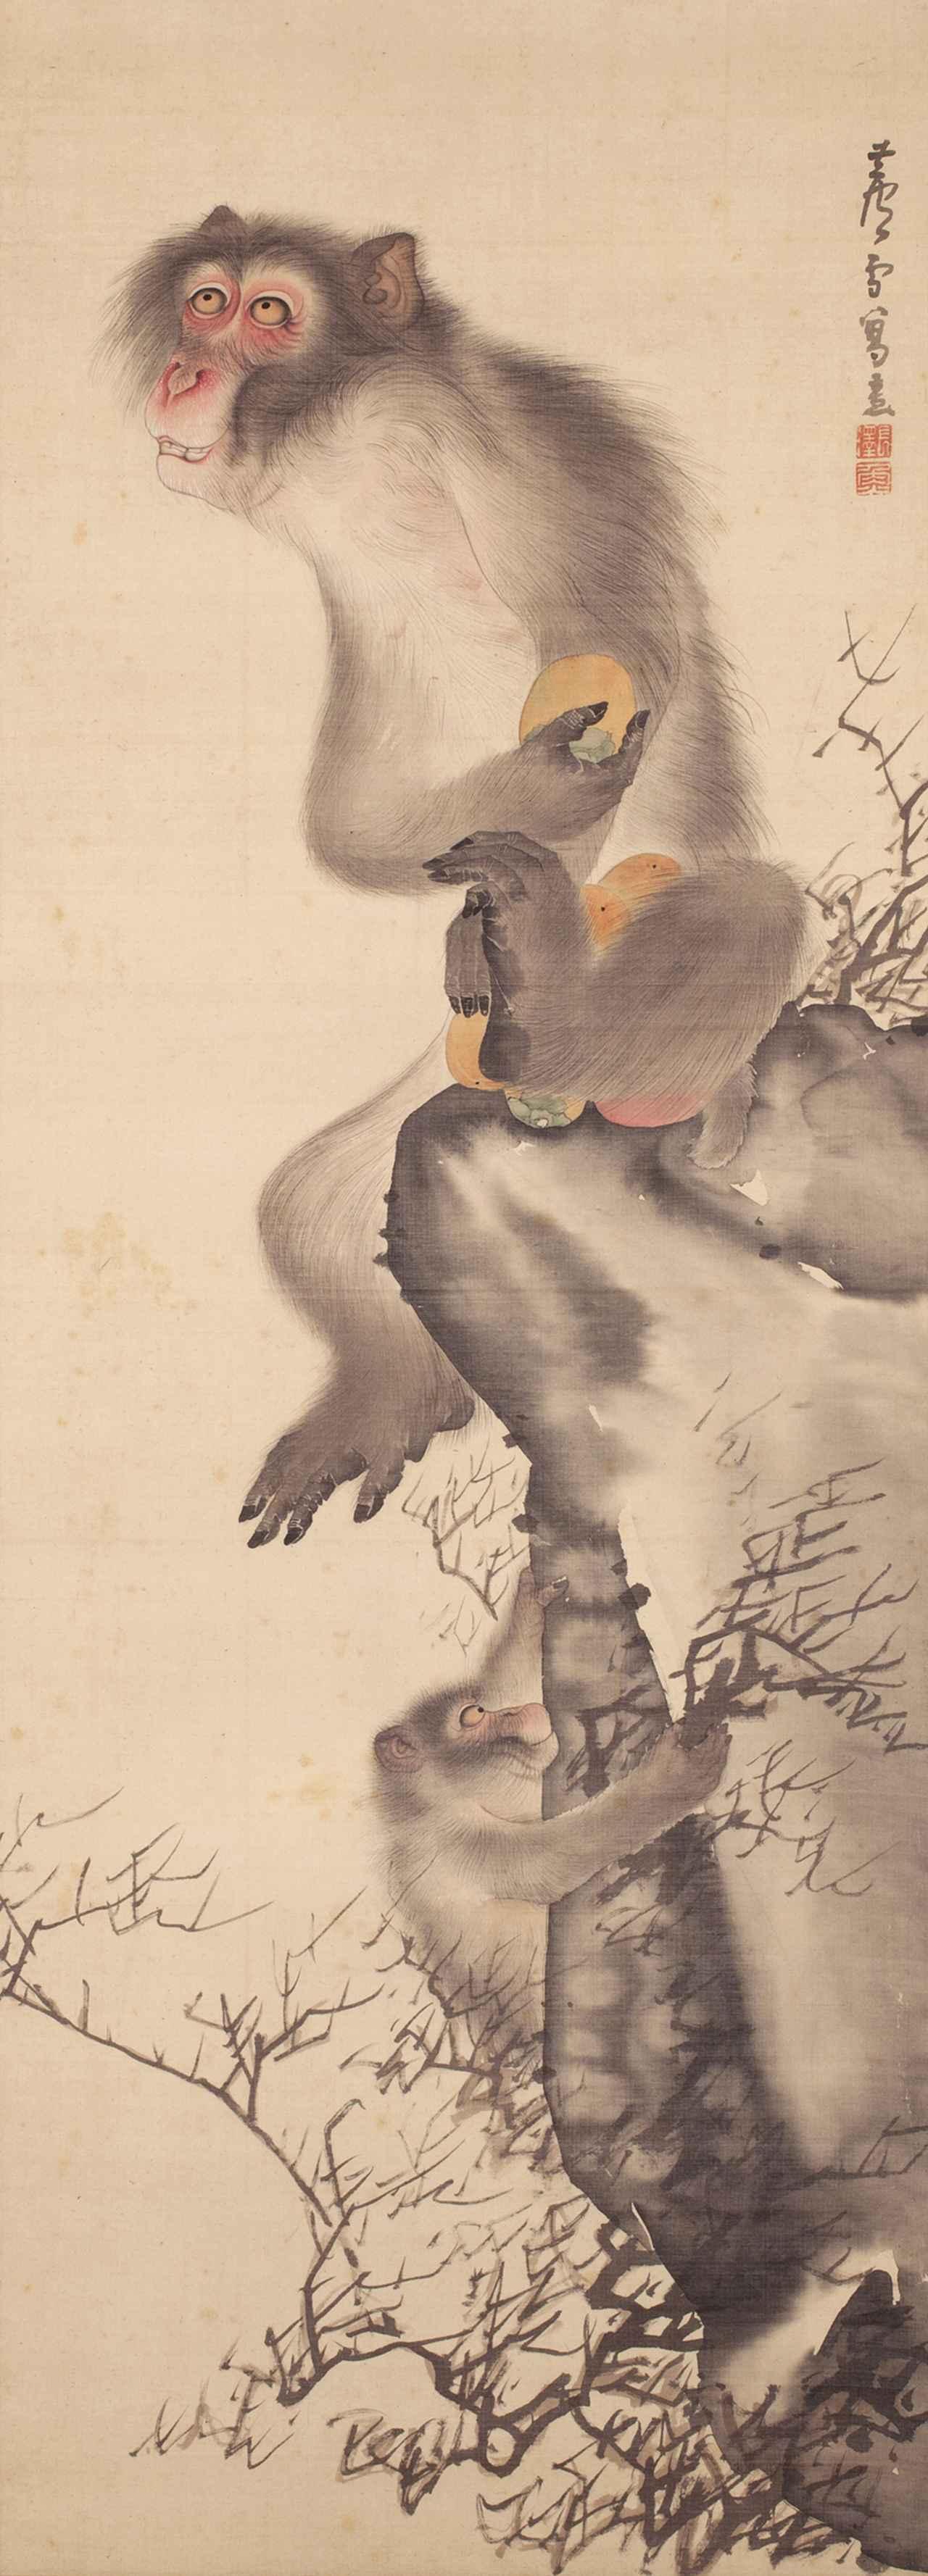 Images : 長沢芦雪 《猿猴弄柿図》